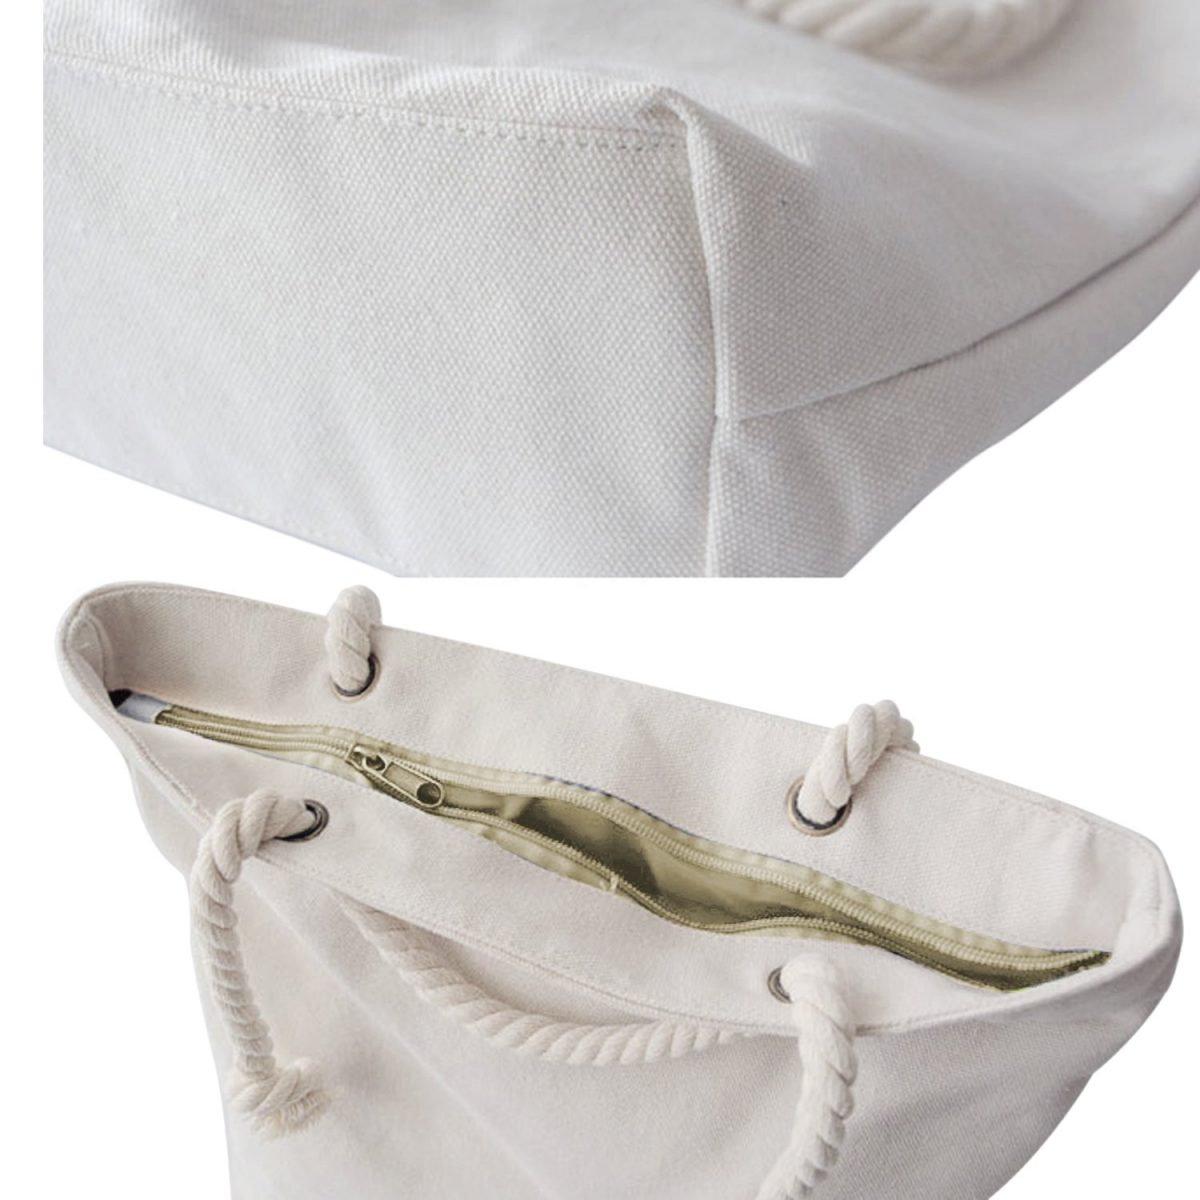 Pembe Lacivert Ekose Desenli Fermuarlı Modern Kumaş Çanta Realhomes